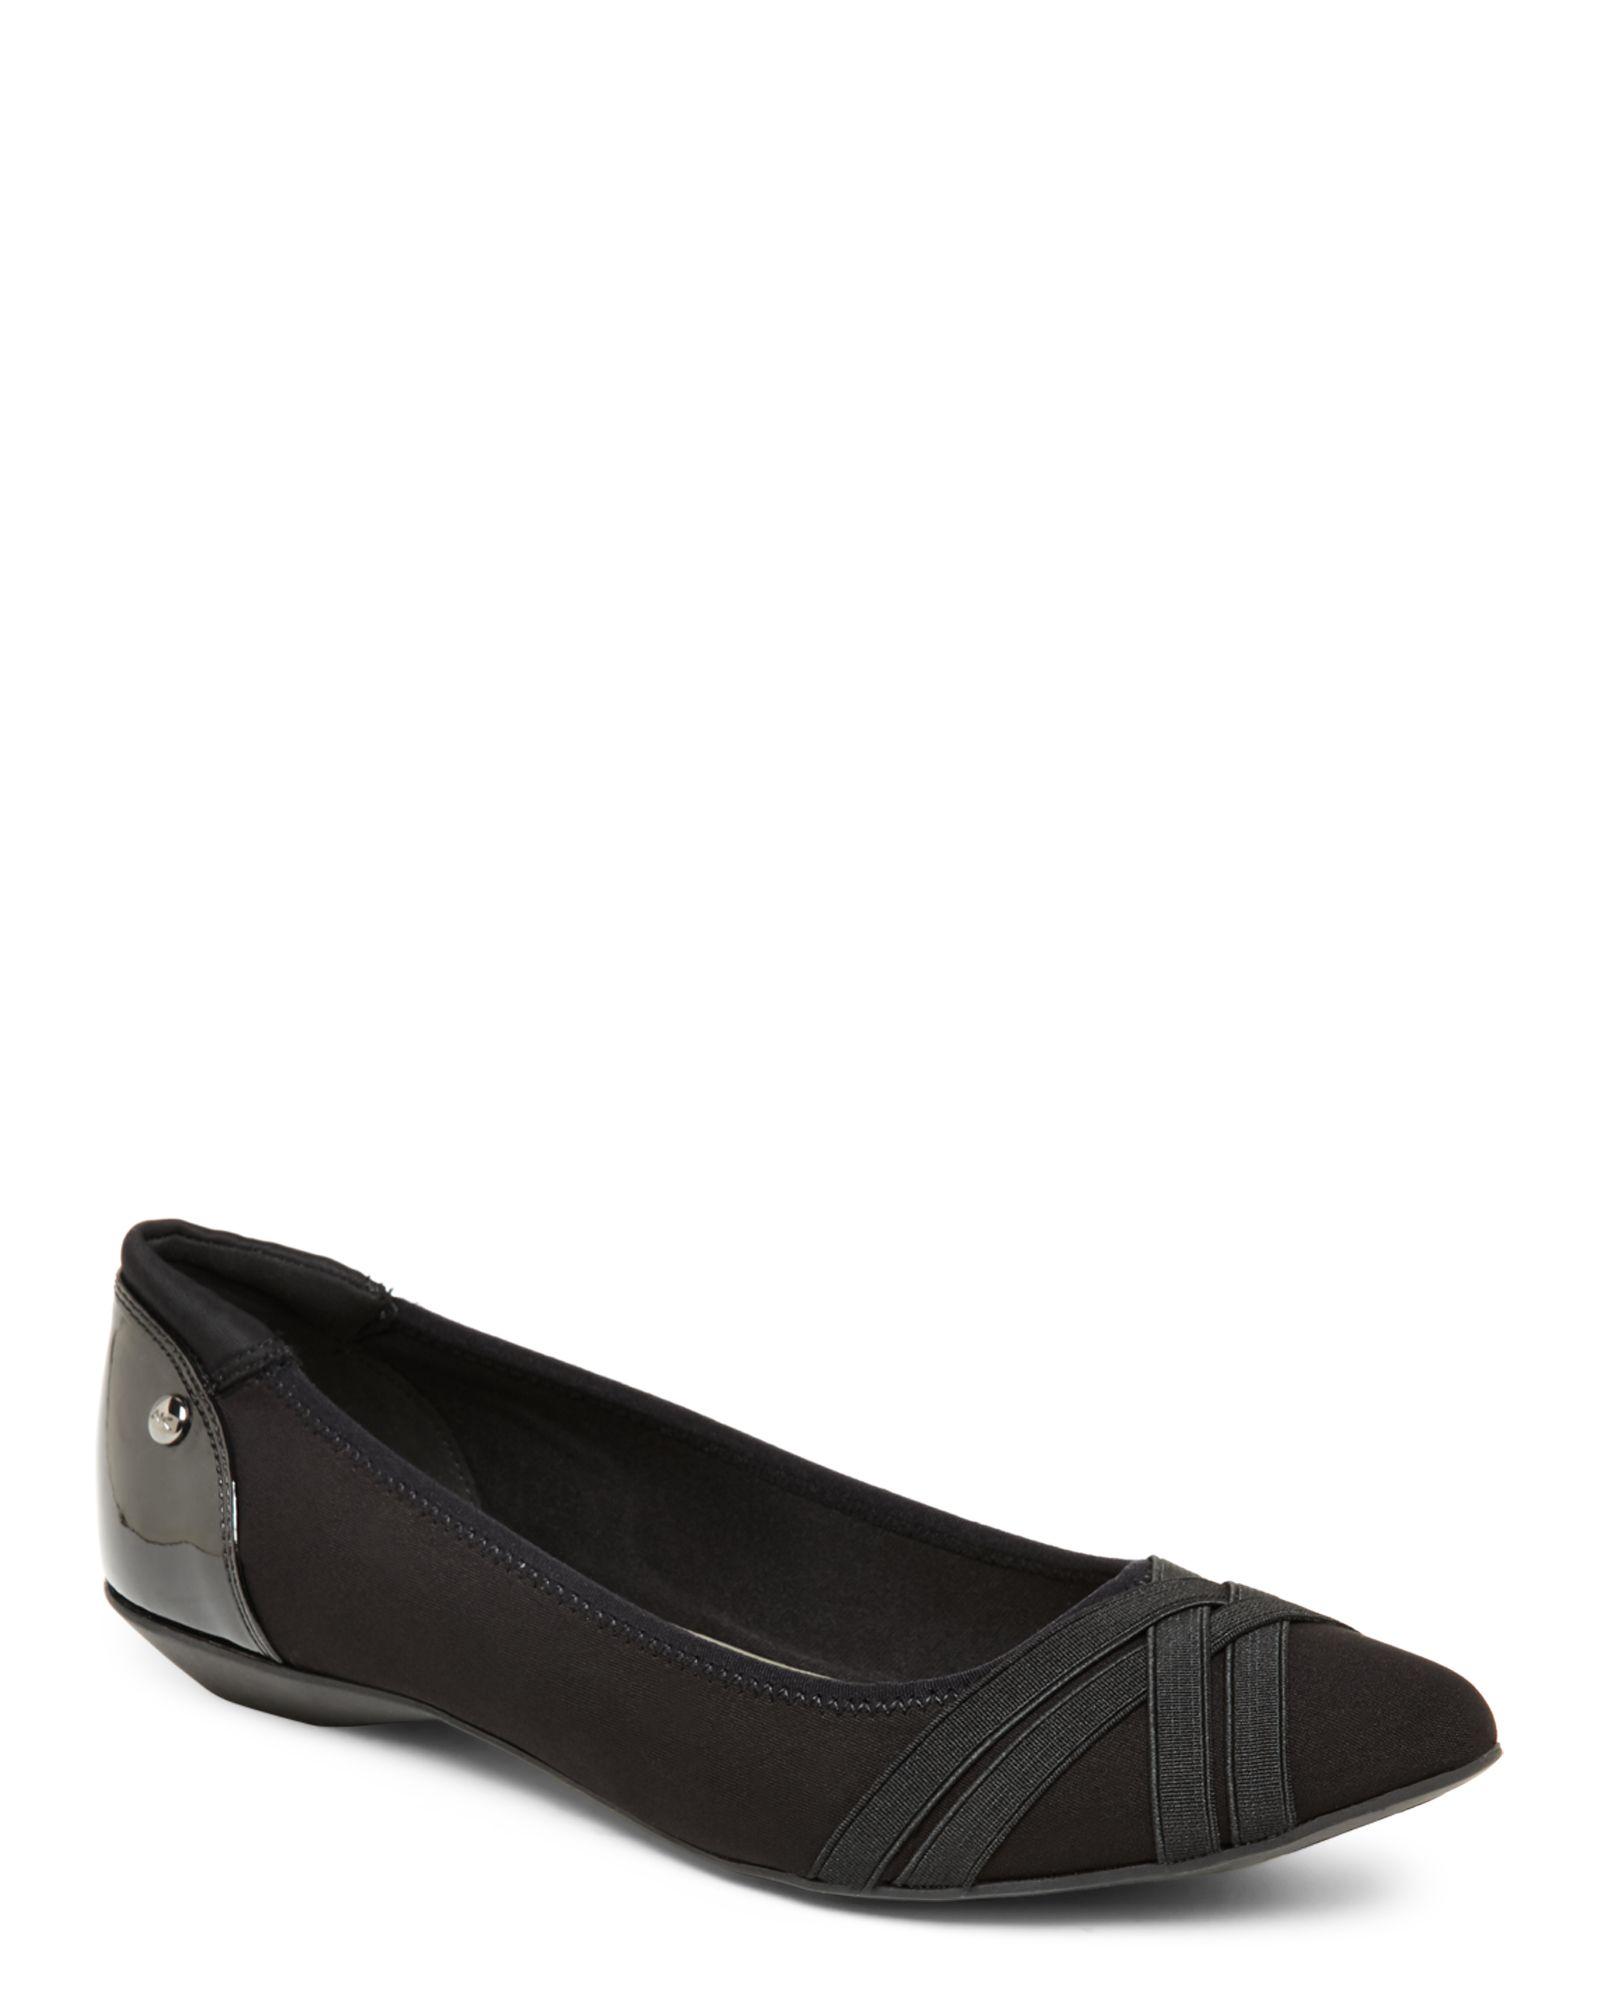 anne klein black flat shoes